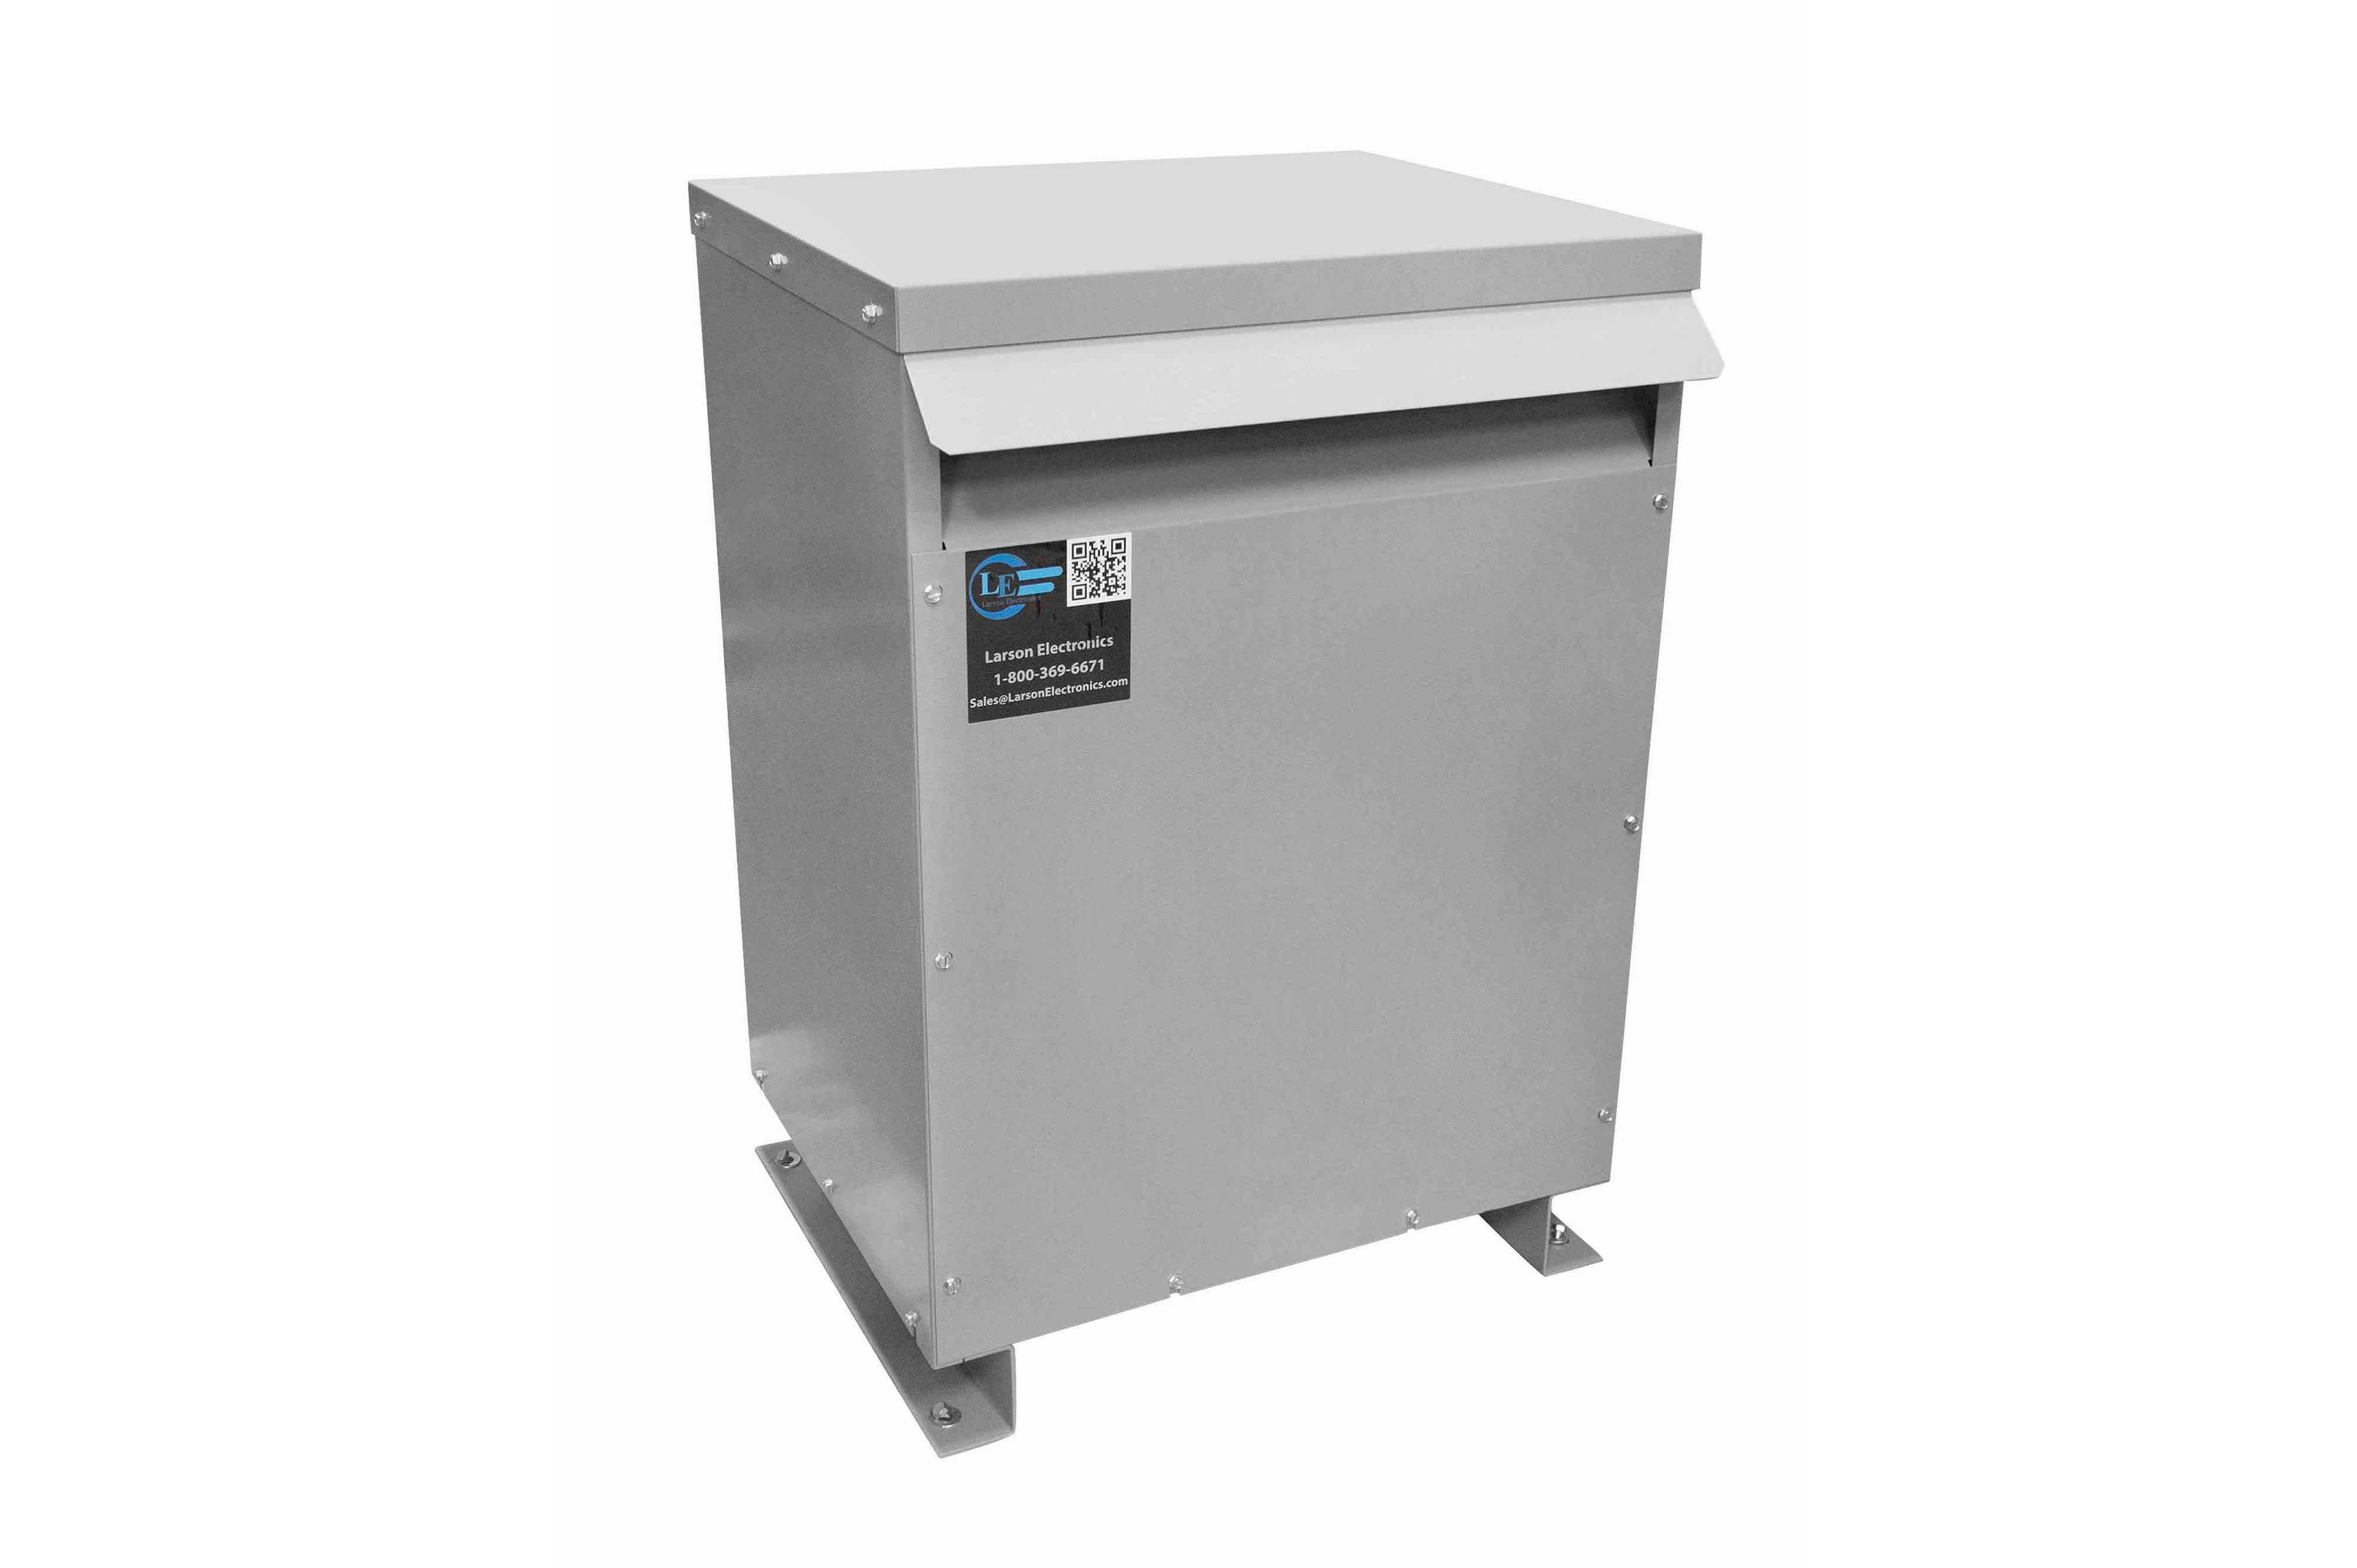 32.5 kVA 3PH Isolation Transformer, 600V Wye Primary, 380V Delta Secondary, N3R, Ventilated, 60 Hz